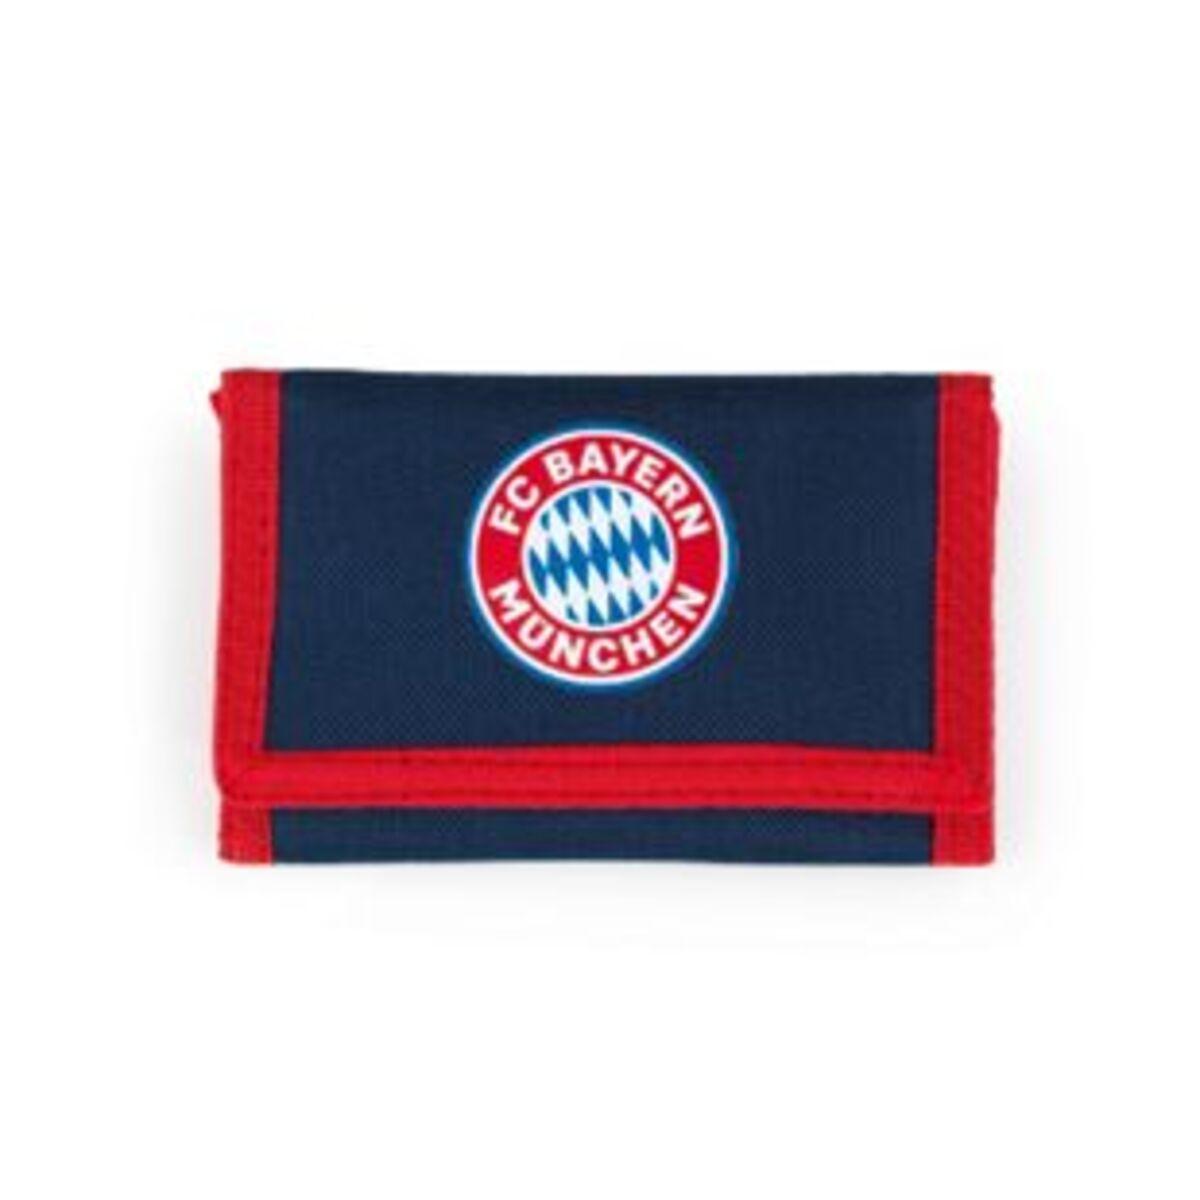 Bild 2 von FCB Geldbörse Mia san Mia blau/rot mit Logo